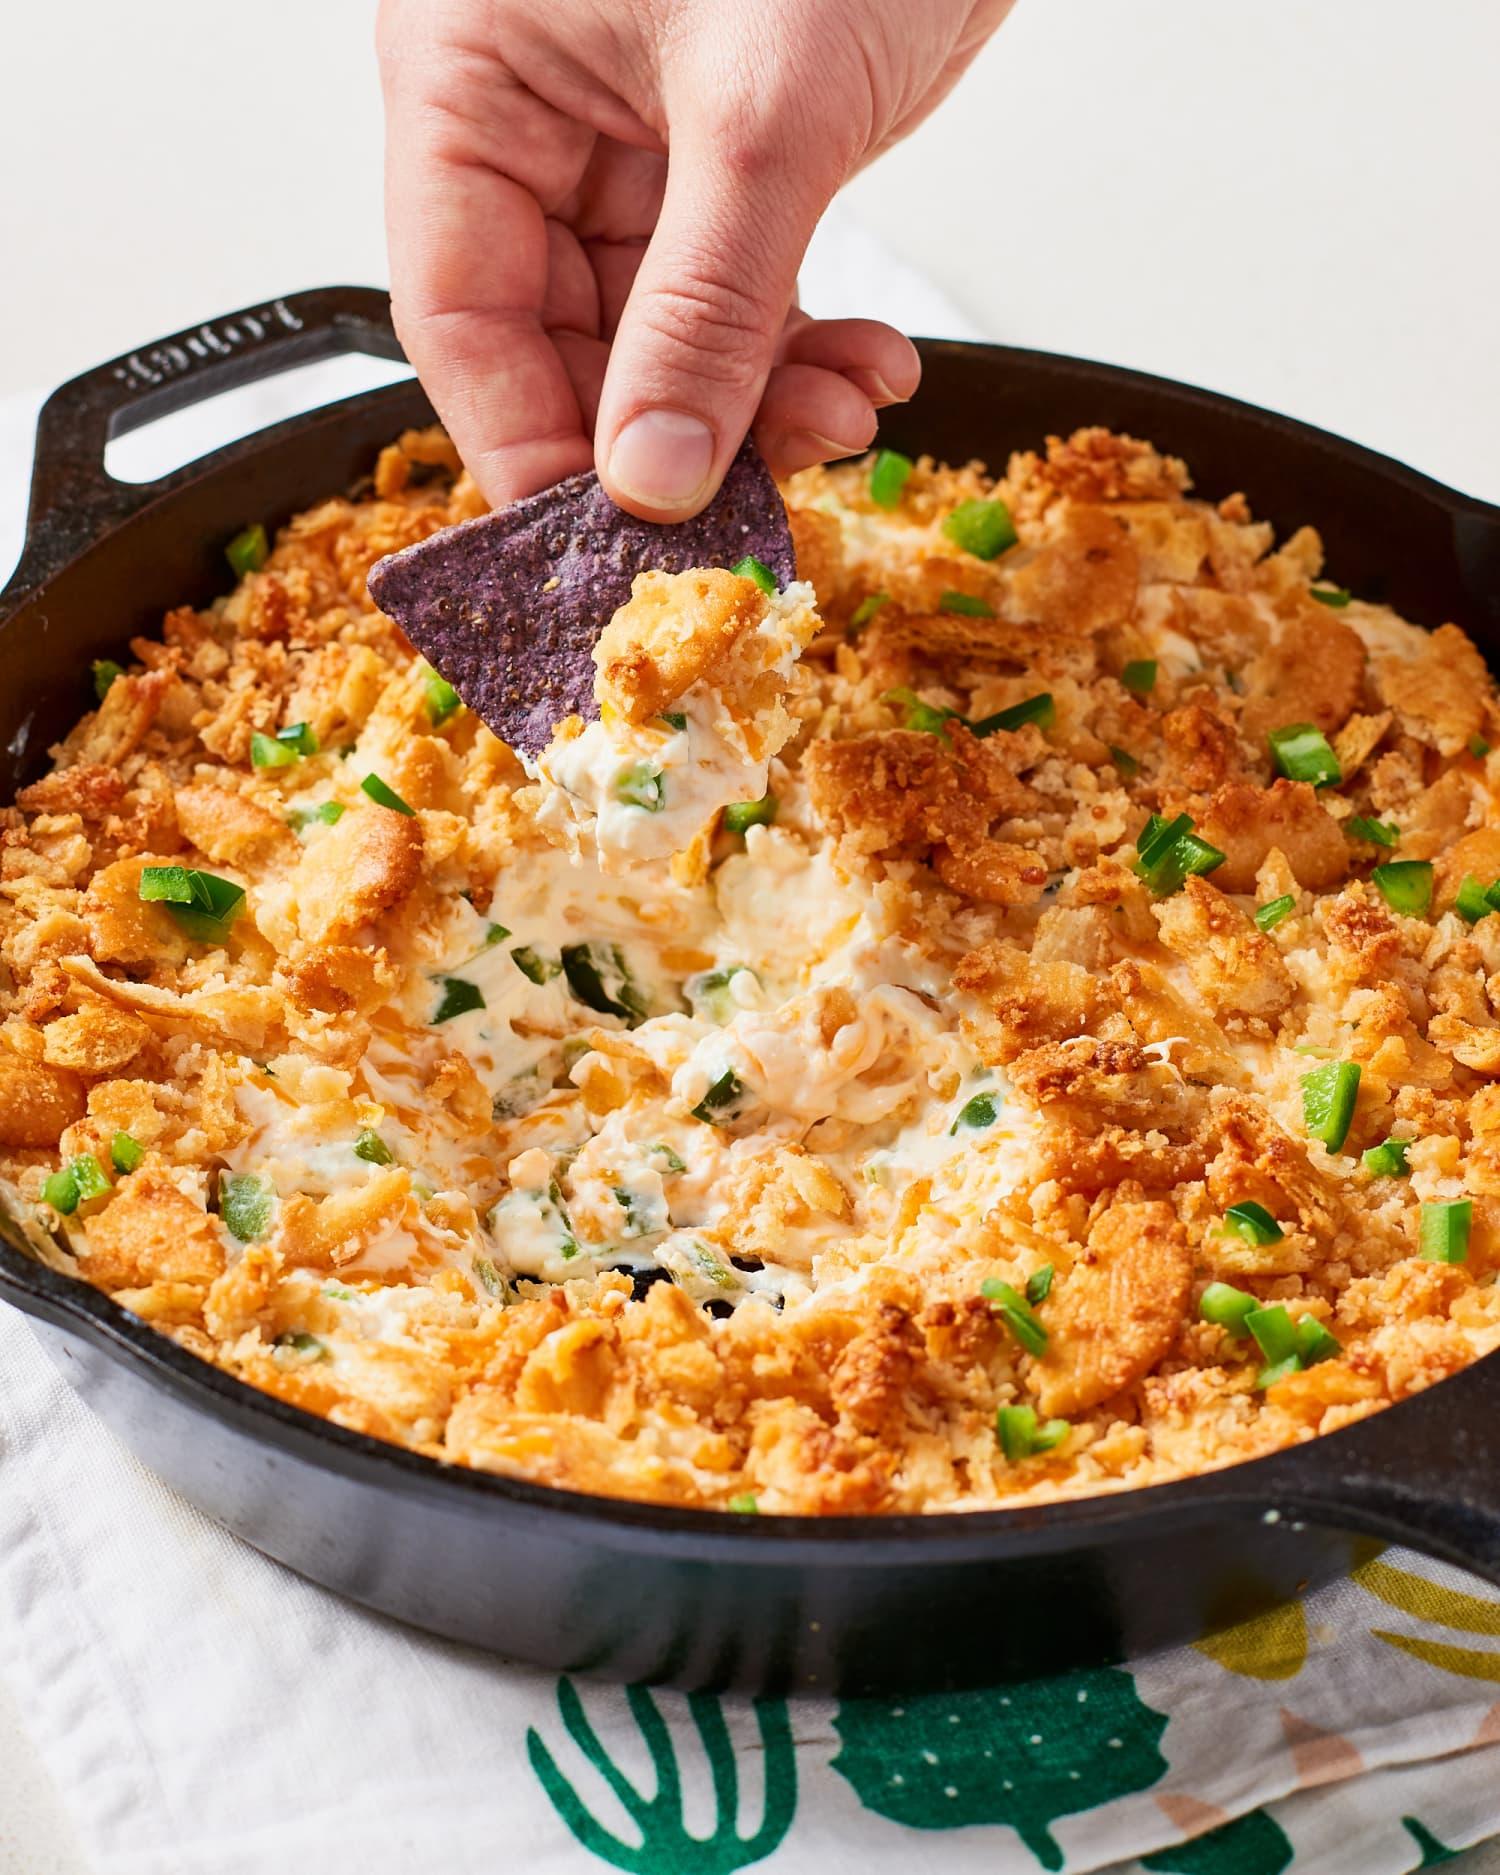 Recipe: Baked Jalapeño Popper Dip